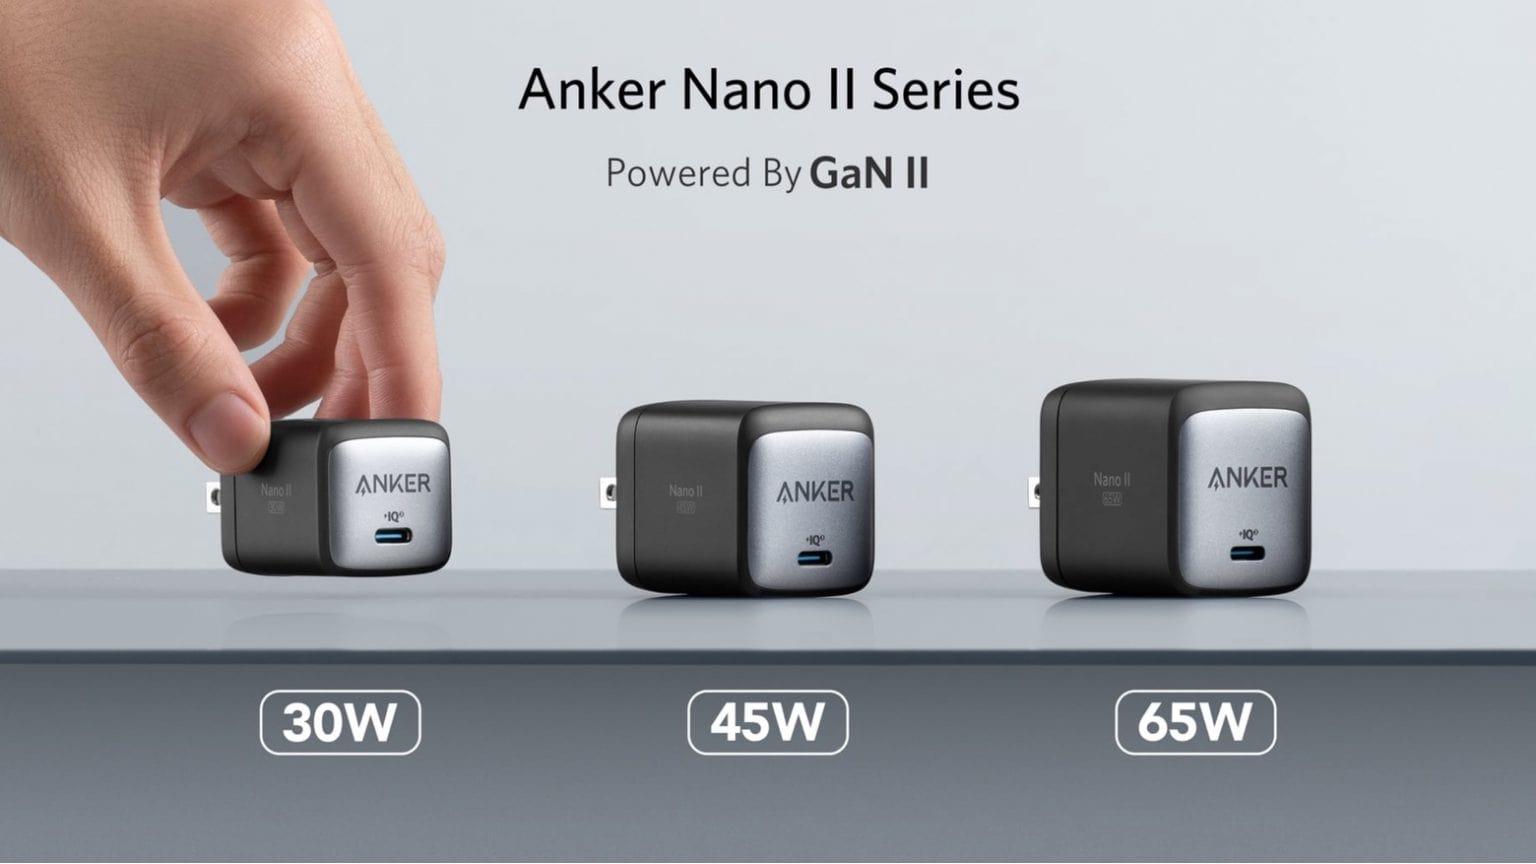 Anker Nano II line offers big power thanks to GaN II